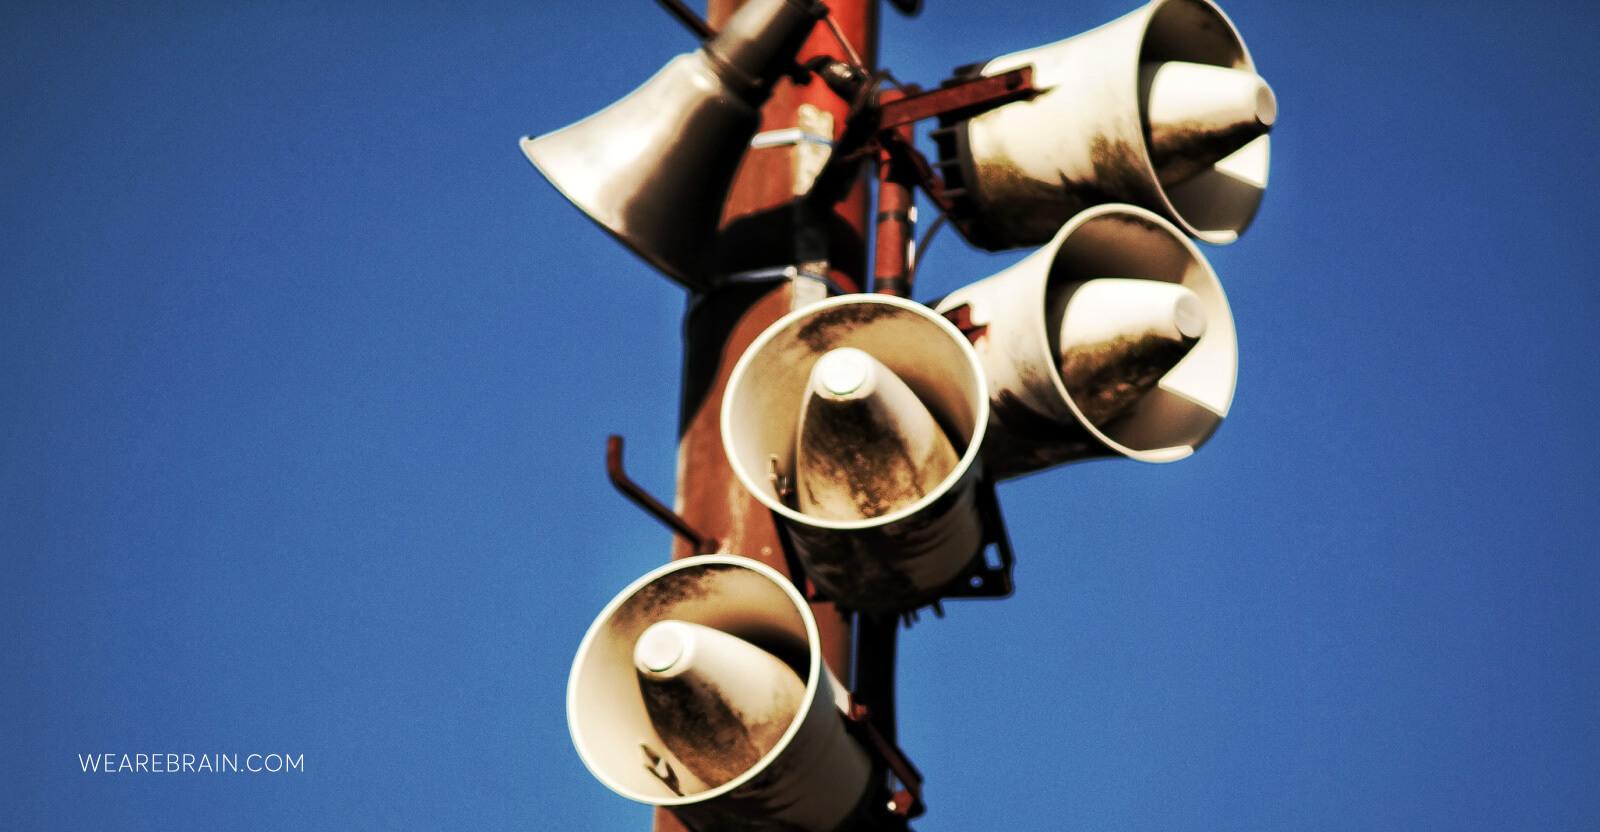 picture of a megaphone speaker